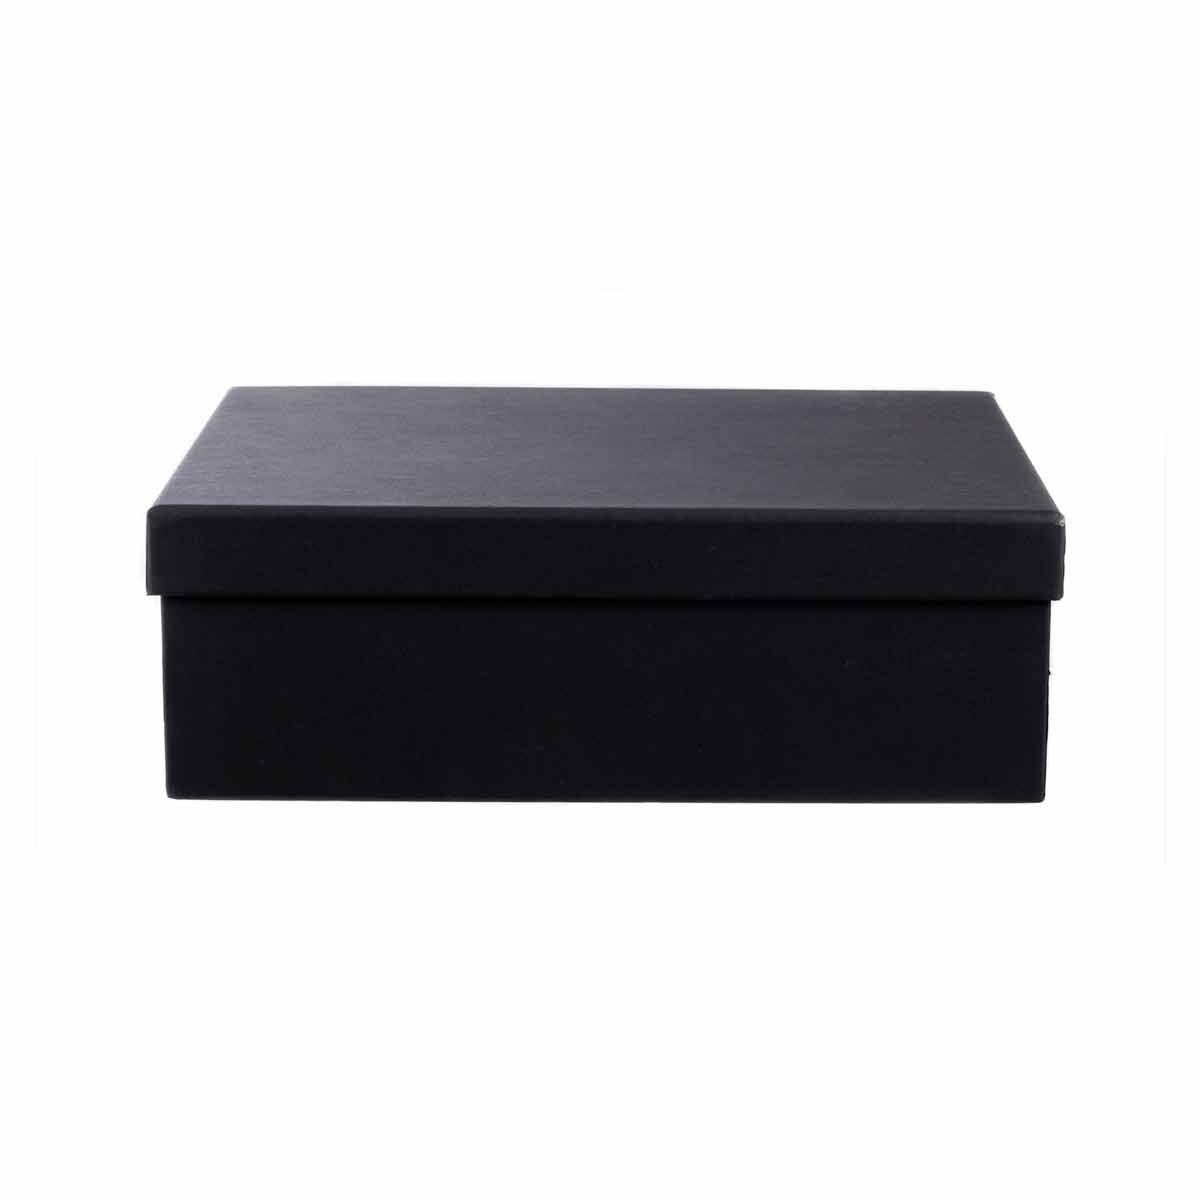 Ryman Storage Box A4 Black